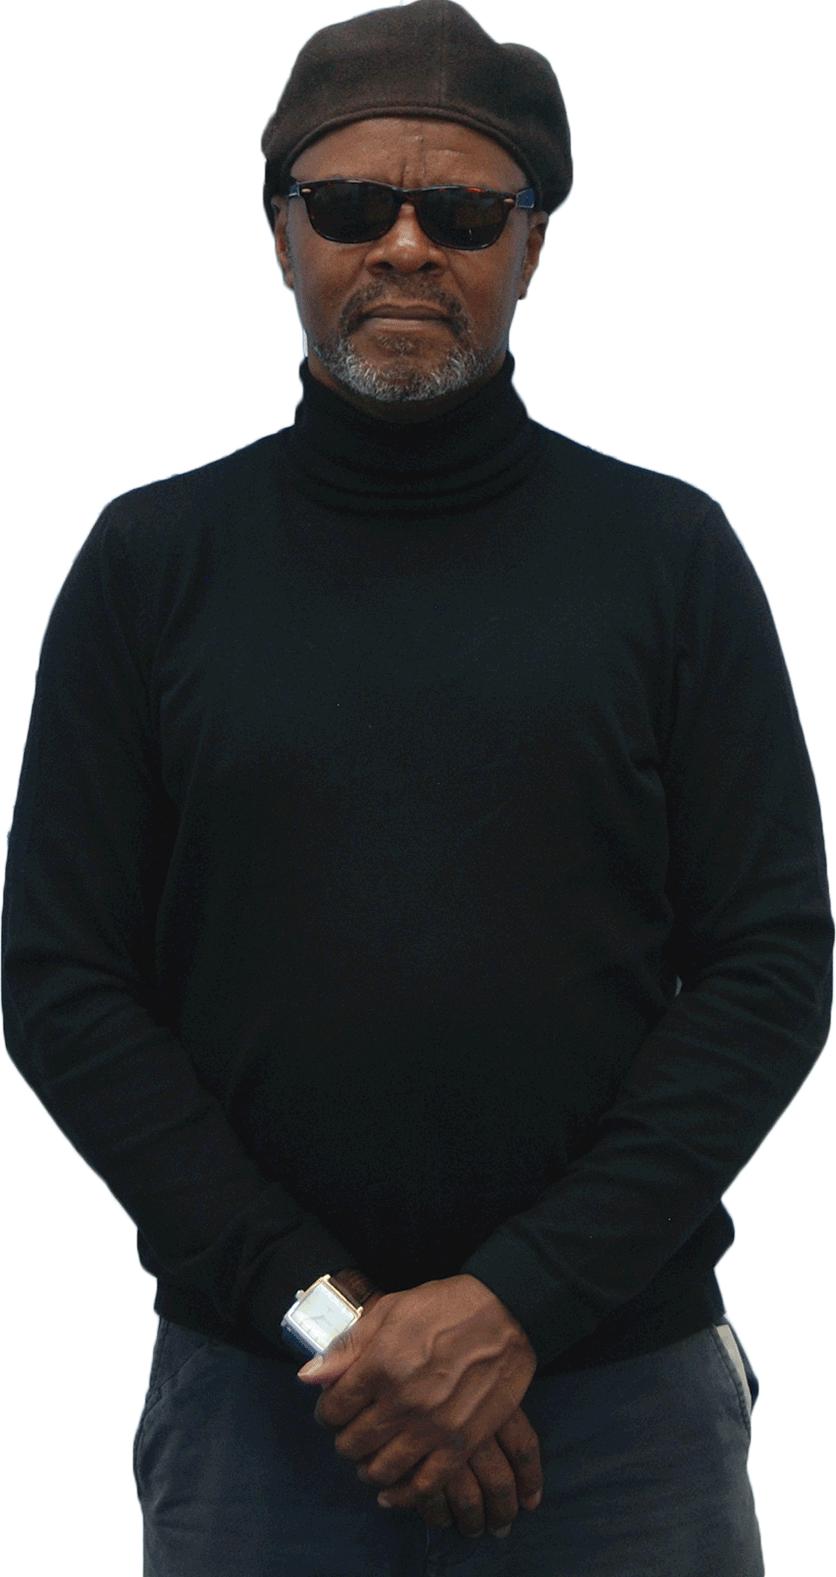 Samuel L Jackson Transparent Background - Samuel L Jackson PNG